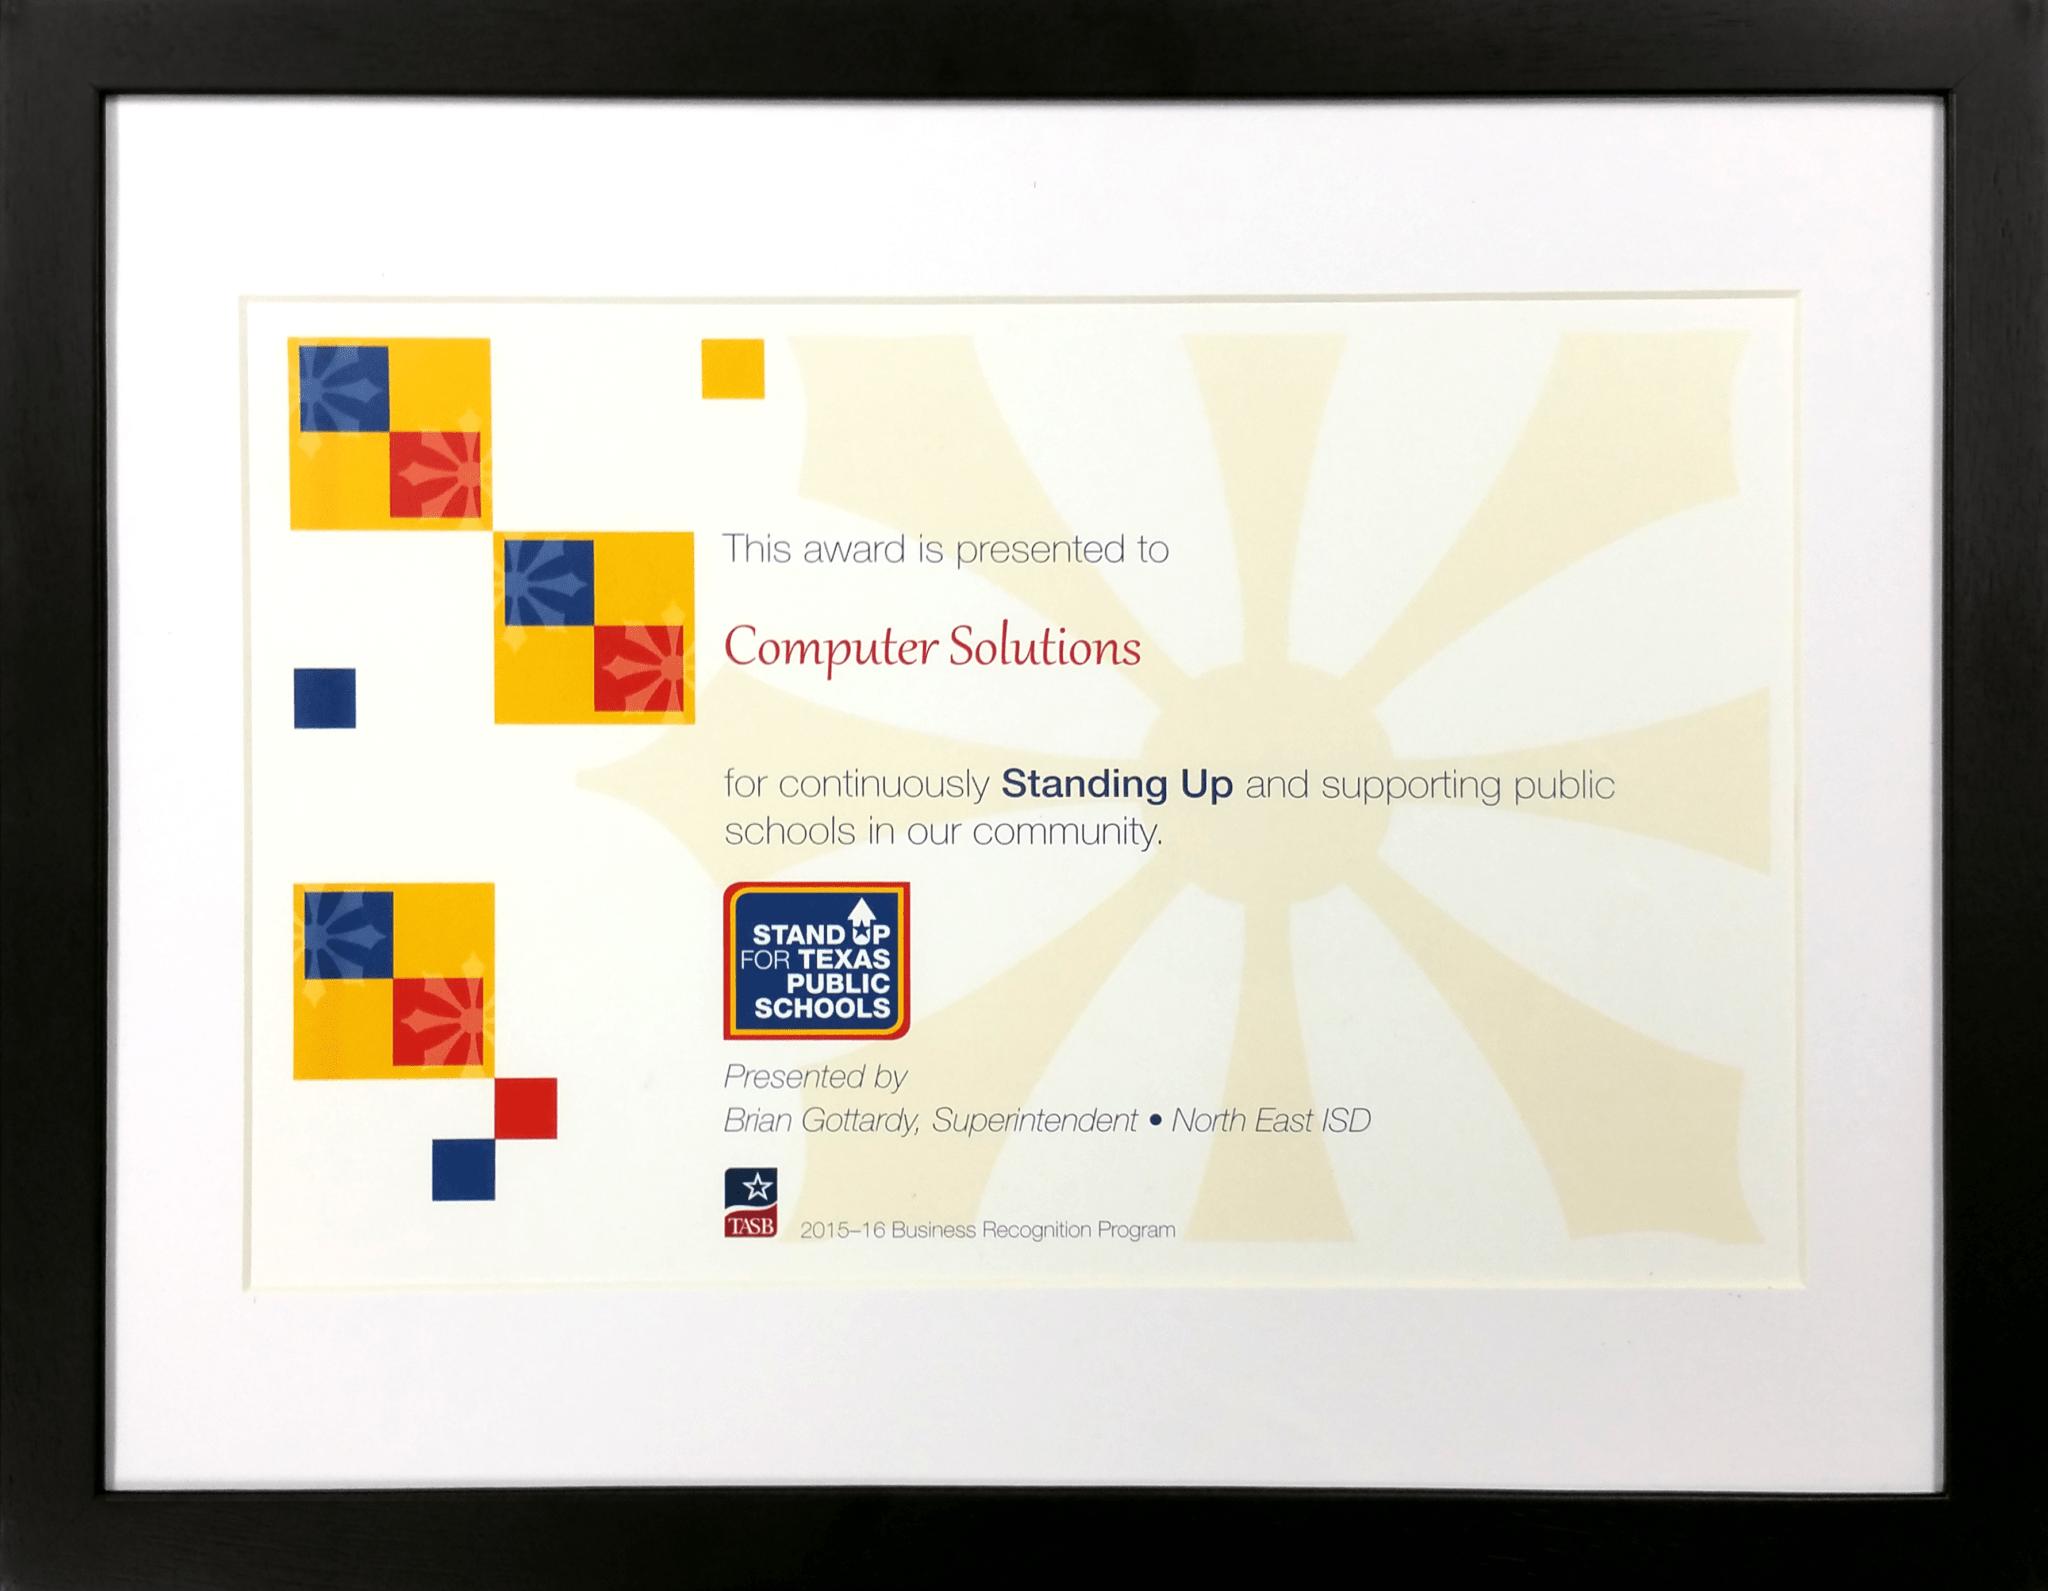 Texas Association of School Administrators' School Board Award Computer Solutions